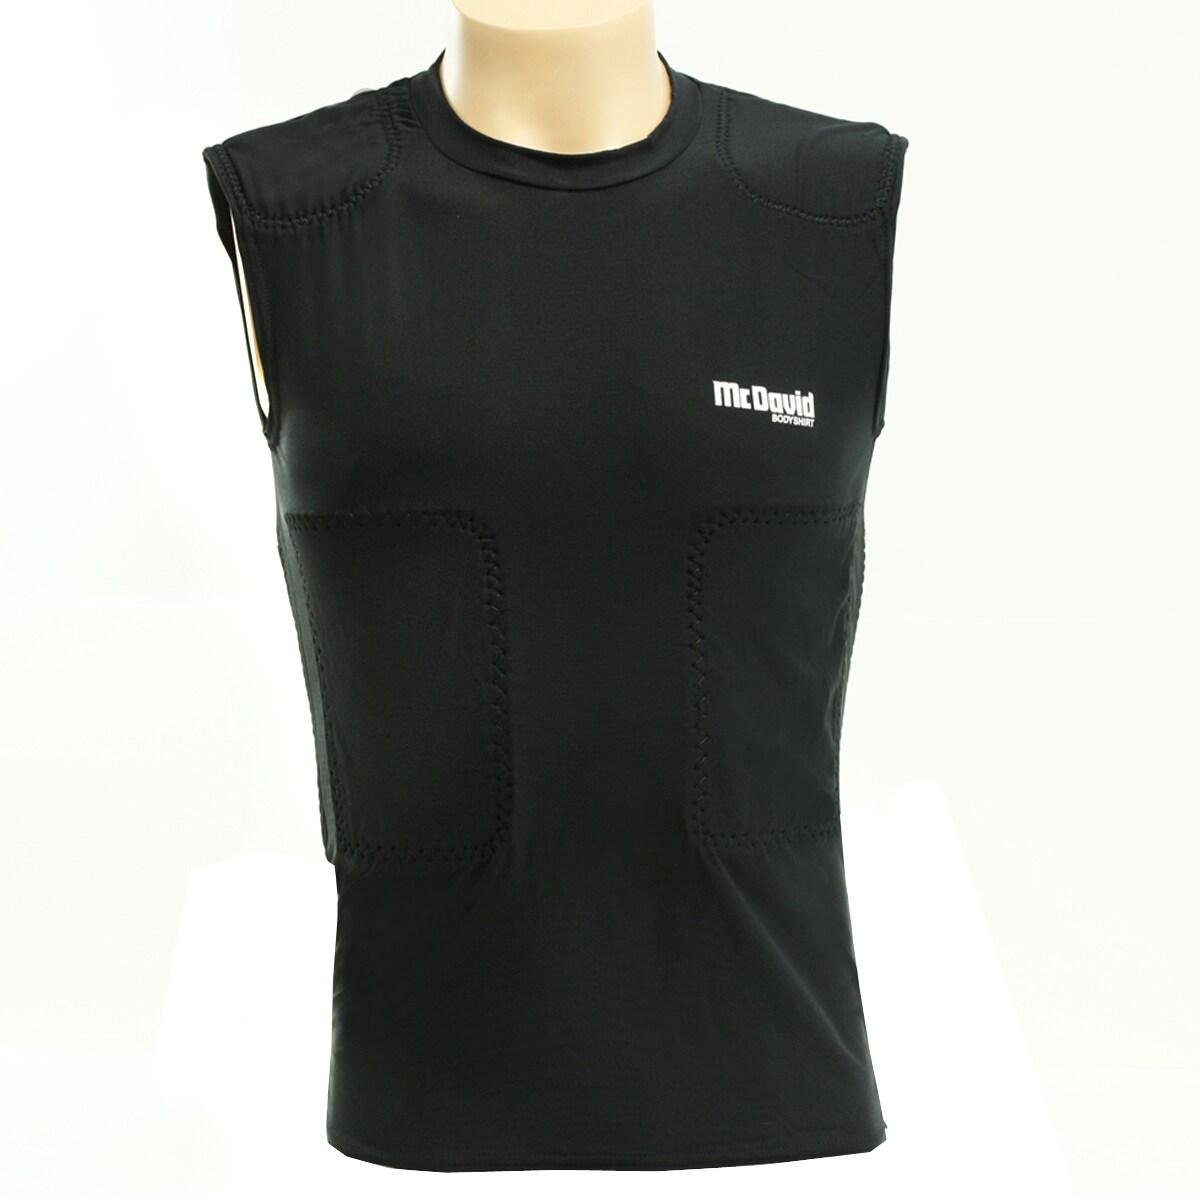 McDavid Men's Black Sleeveless Body Shirt